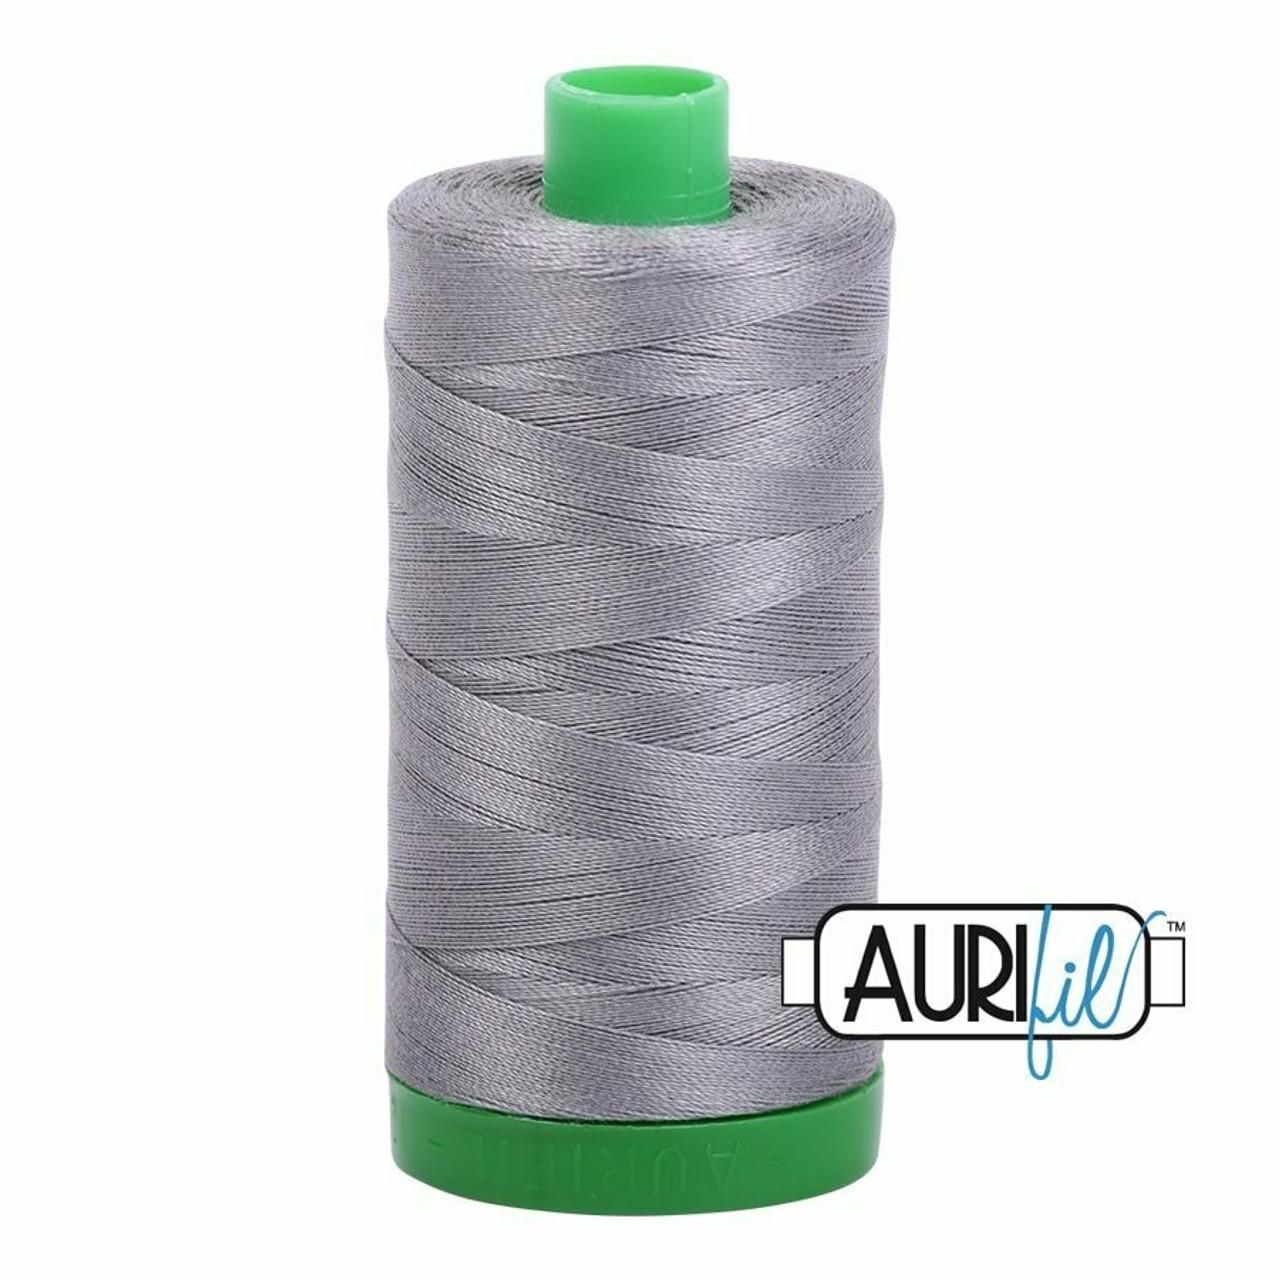 Aurifil 40wt Artic Ice (2625) thread